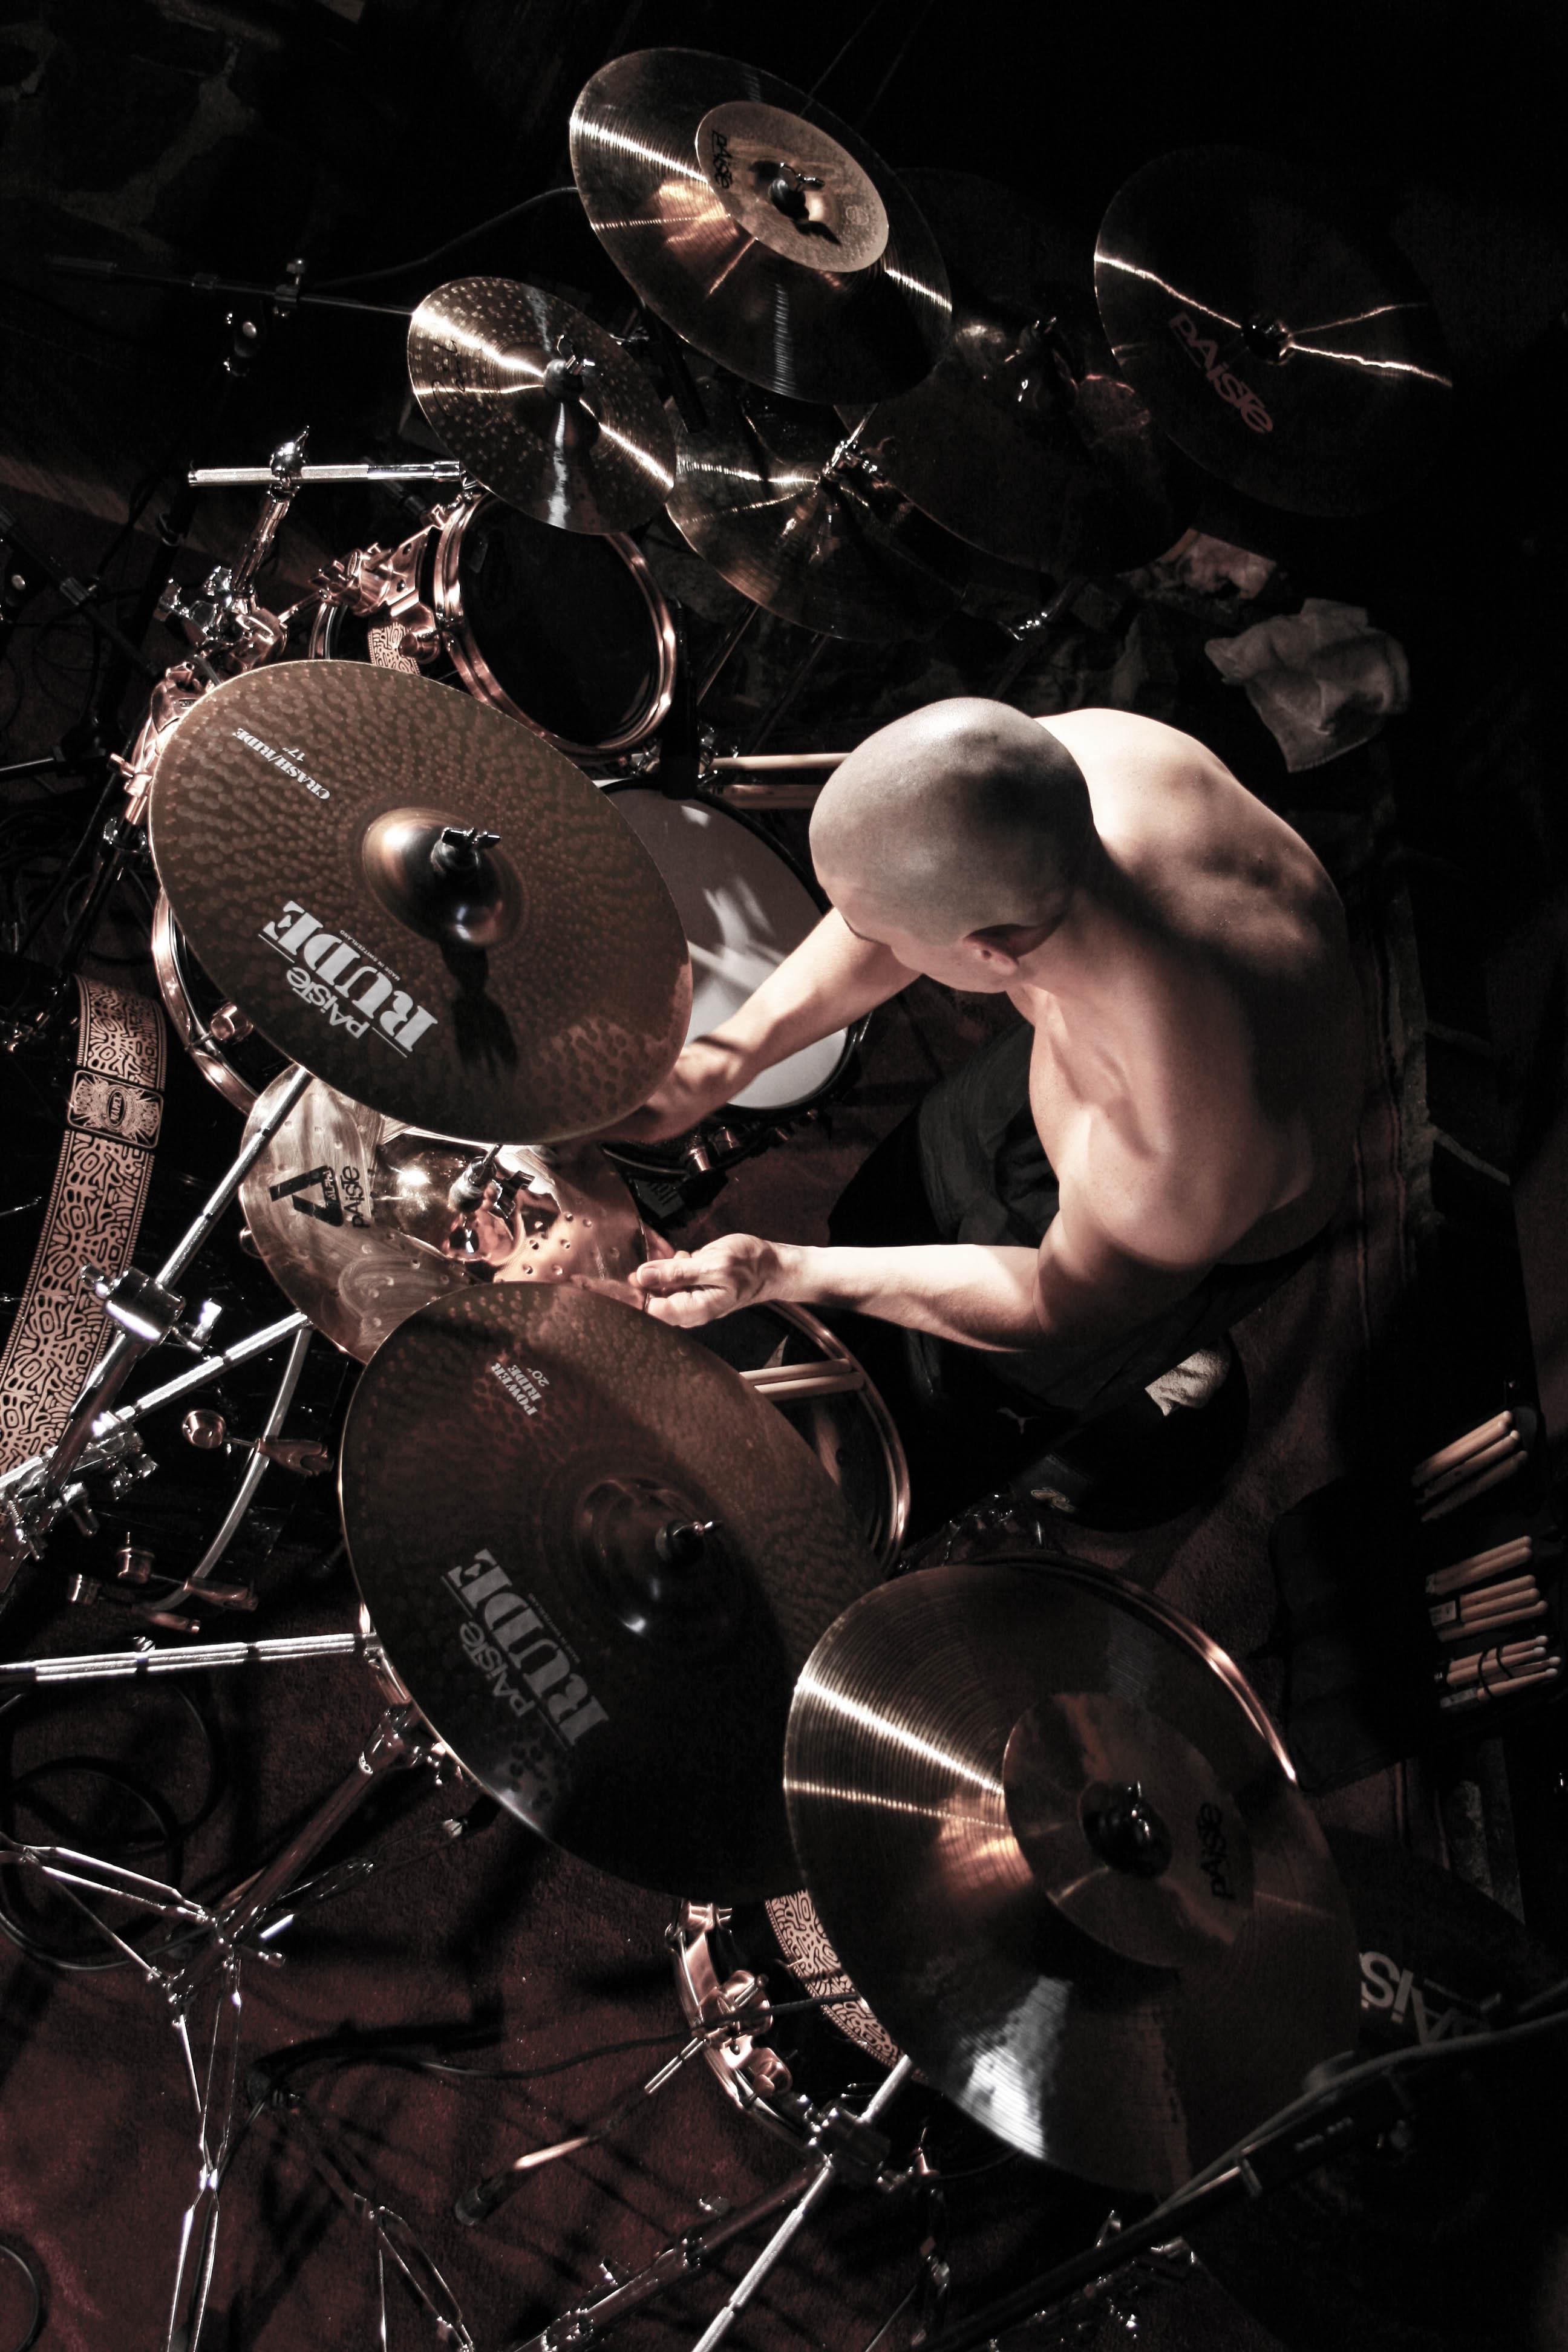 Oli Beaudoin (2013) - Recording drum kit setup